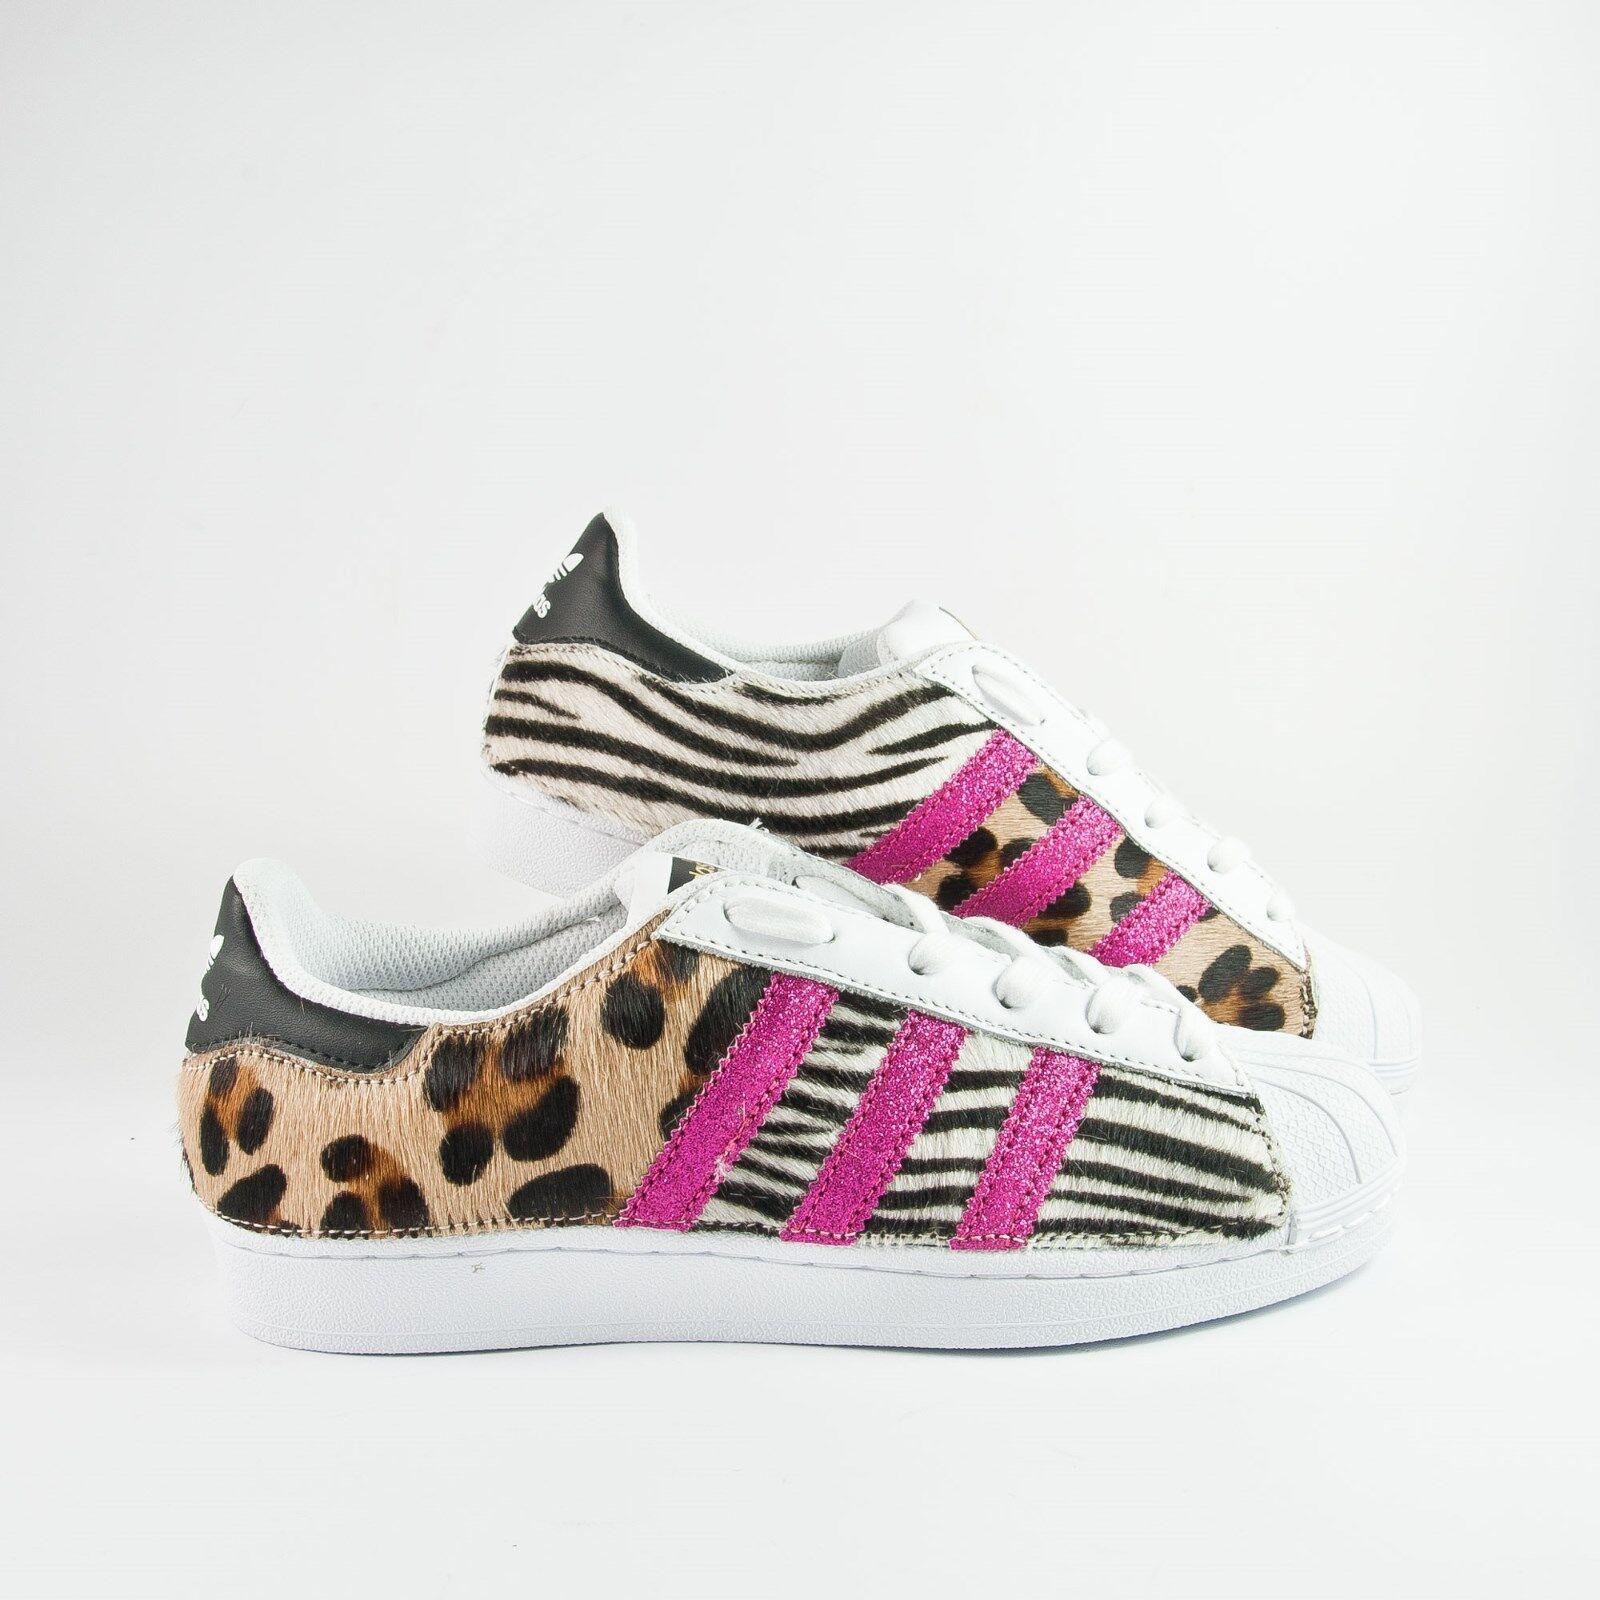 Scarpe adidas superstar con cavallino maculato e cavallino zebrato rughe e rughe zebrato fucxi 97a056